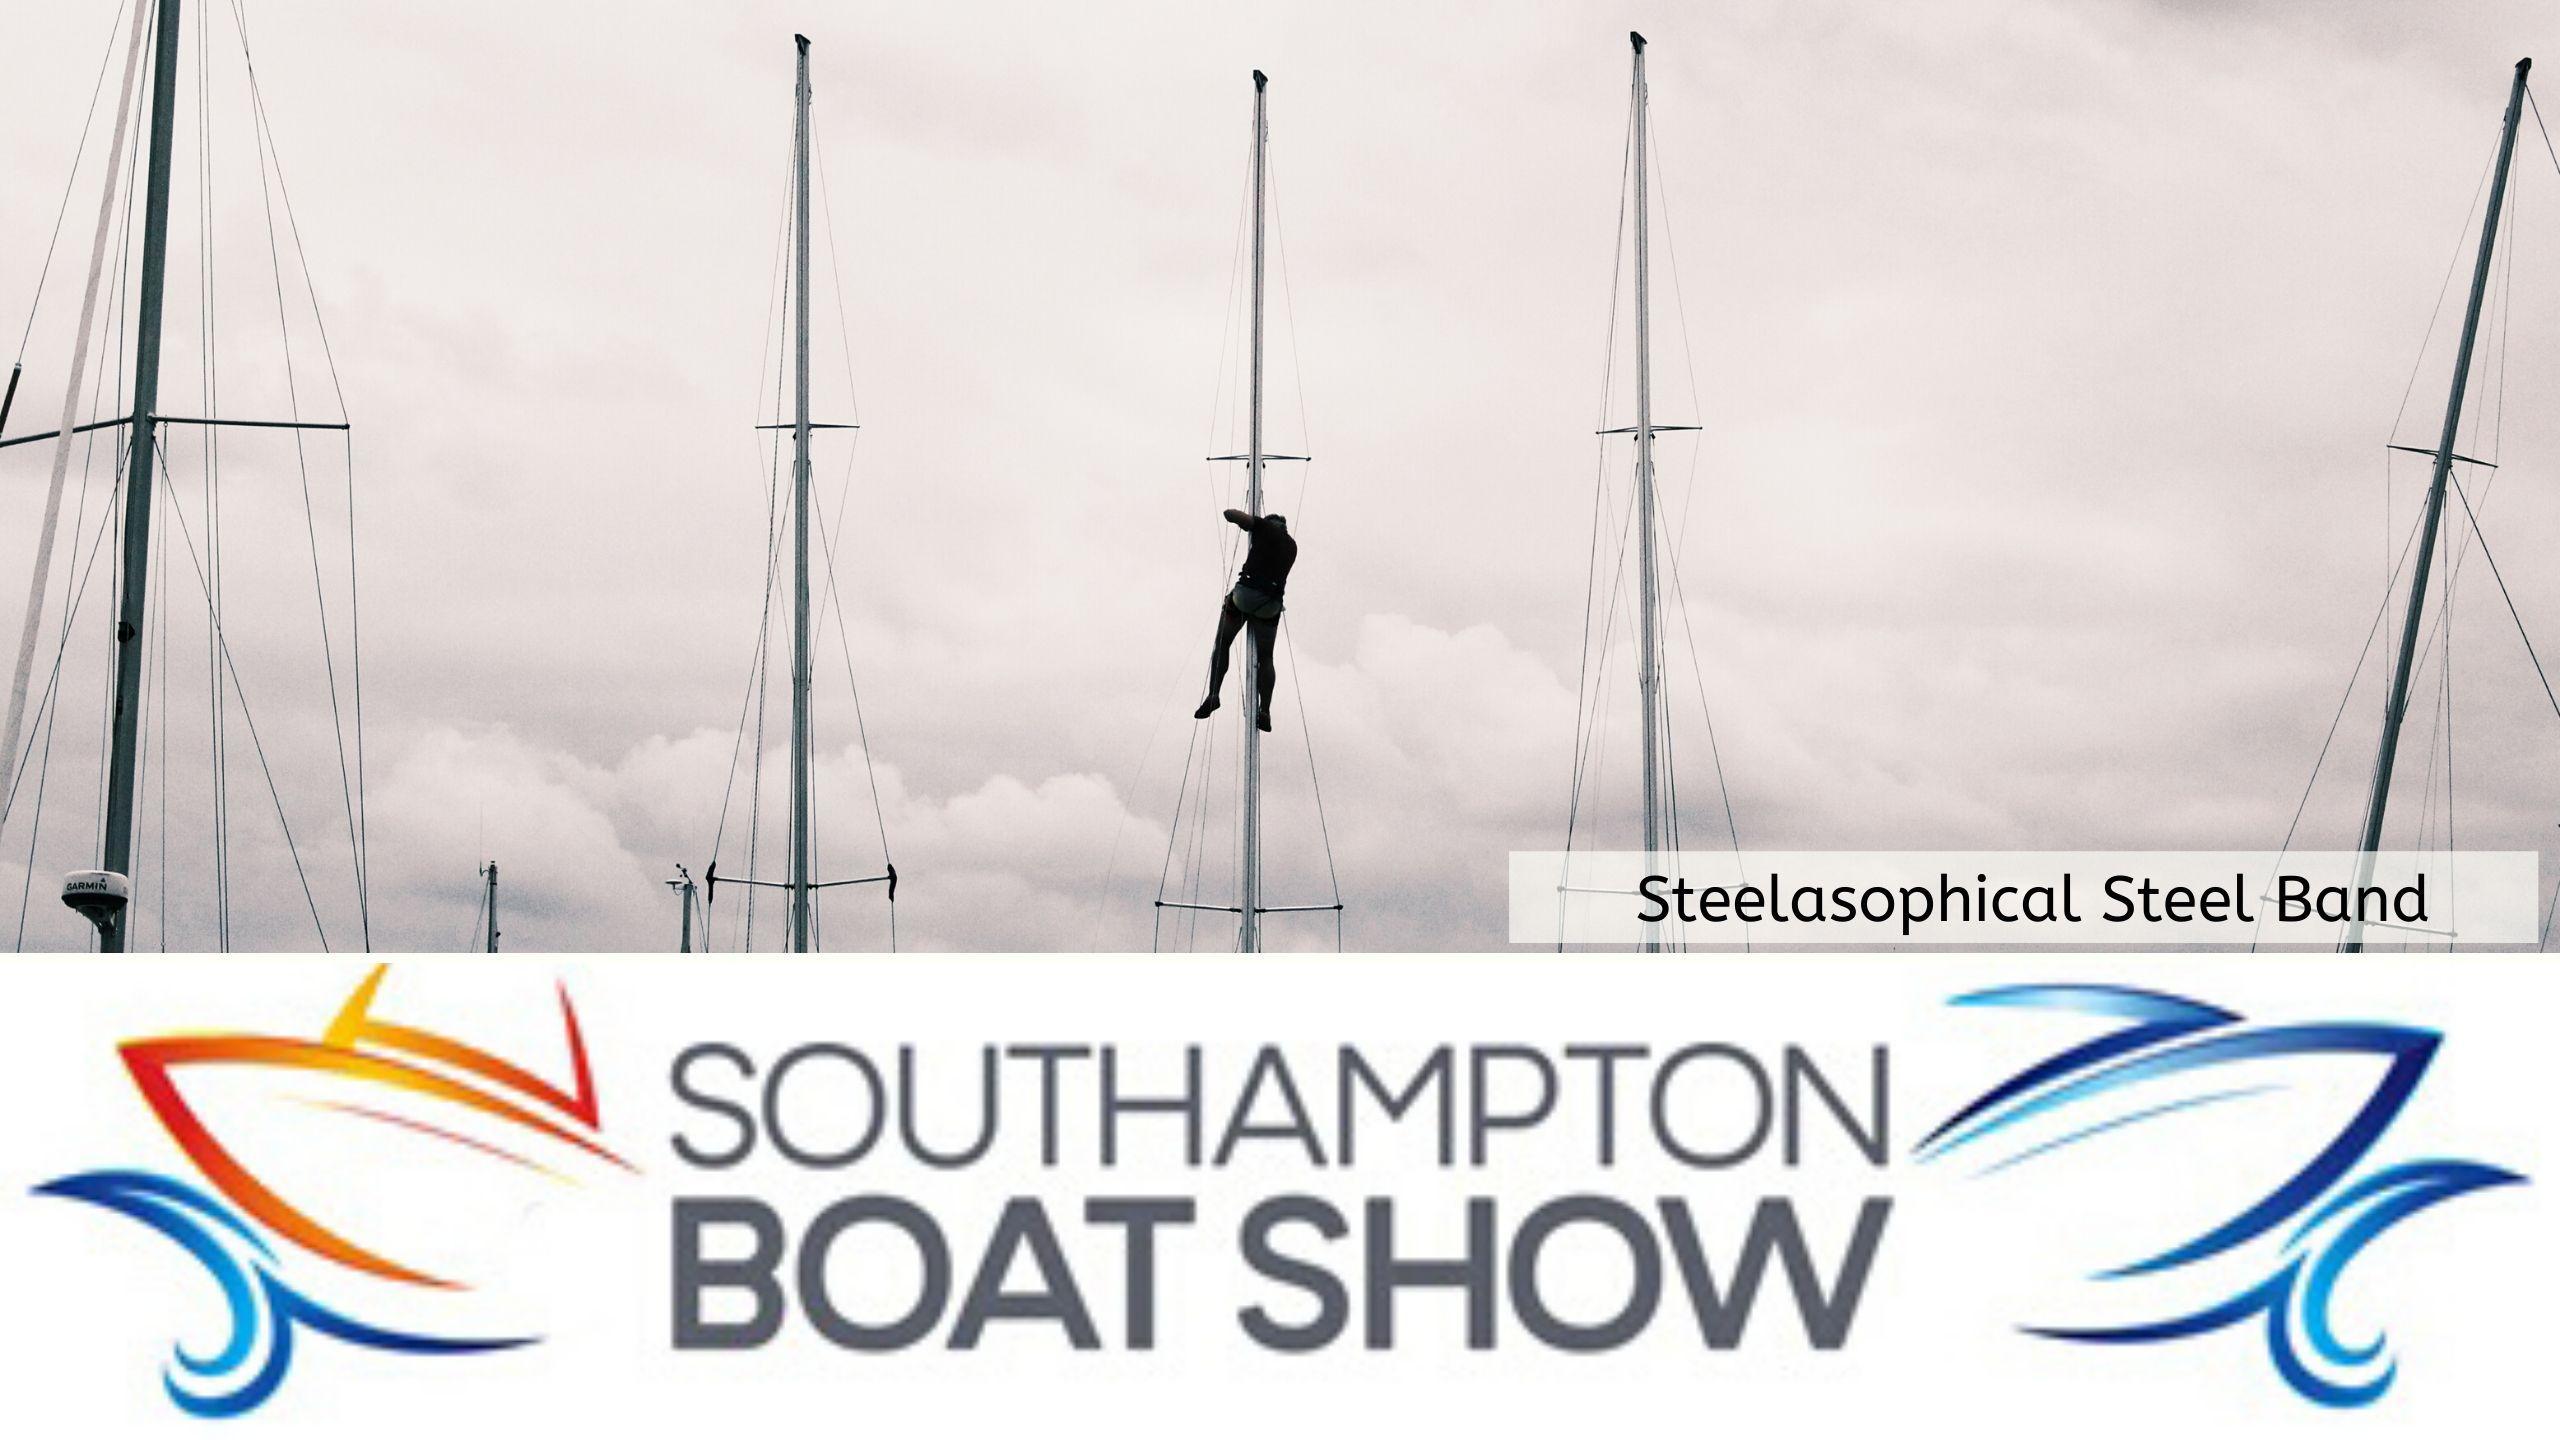 Steelasophical Steel Band Southampton Boat Show Yacht Market 2022